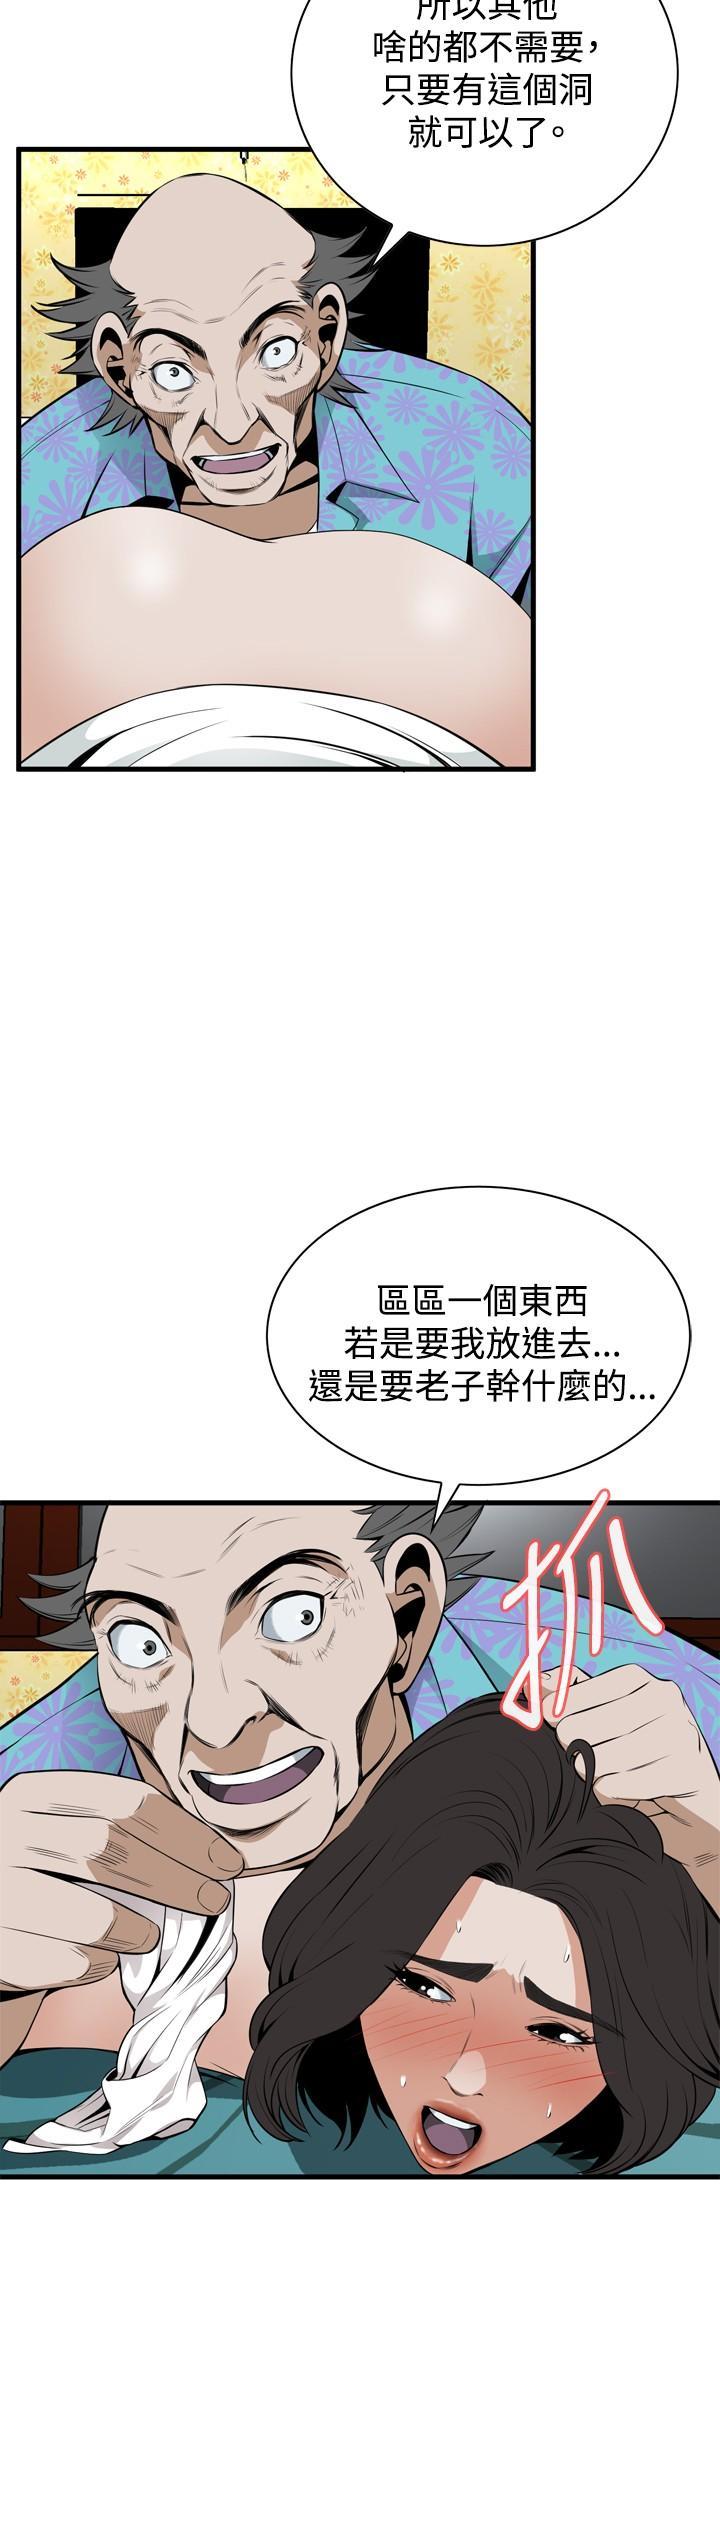 Take a Peek 偷窥 Ch.39~60 [Chinese]中文 133